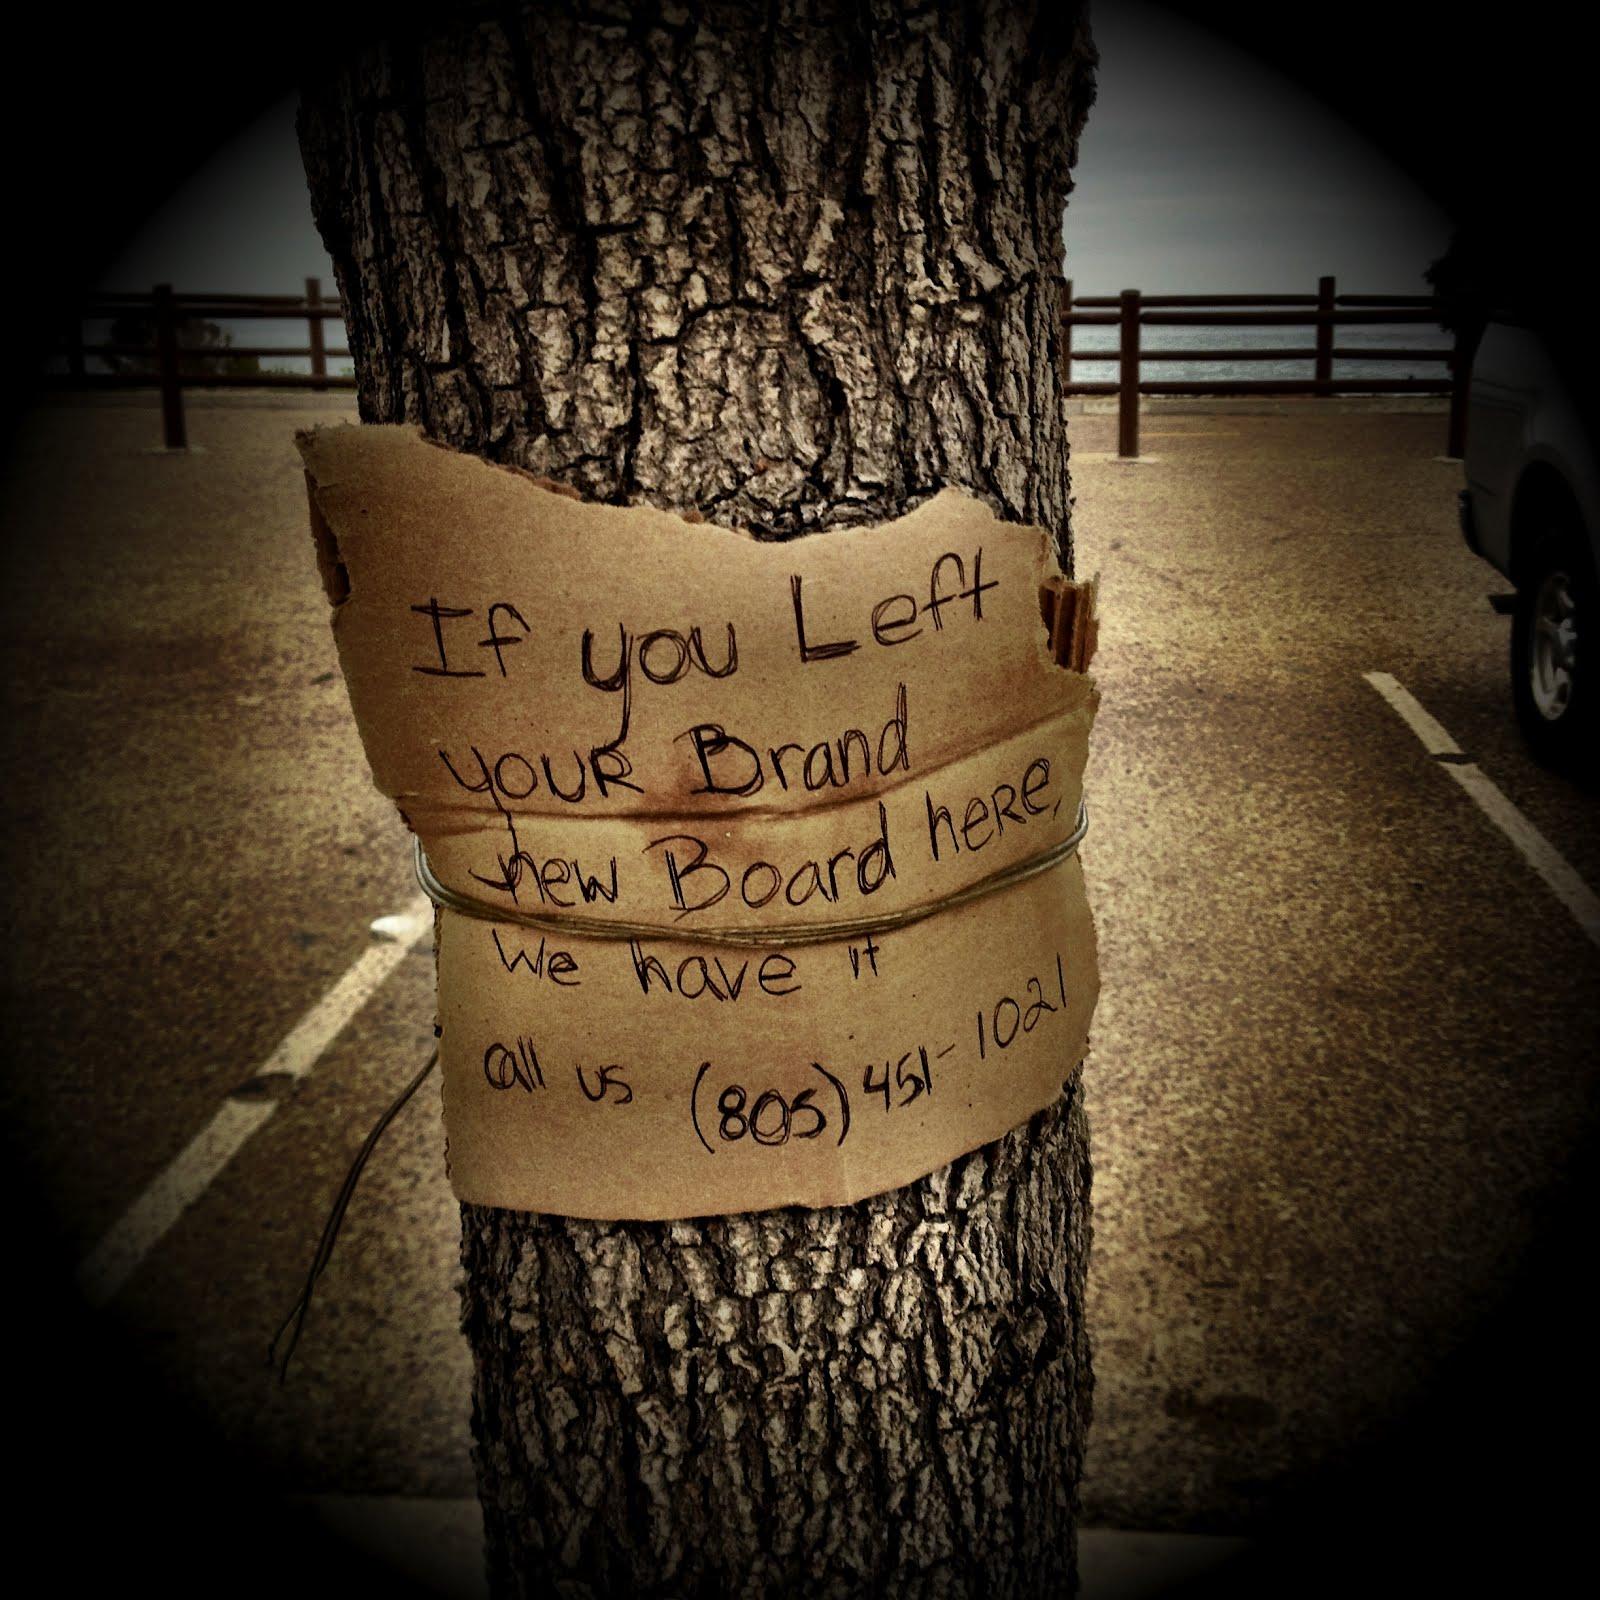 1. Ketika beberapa anak meninggalkan catatan ini untuk melacak pemilik skateboard yang terlupakan yang mungkin dengan mudah dicuri.